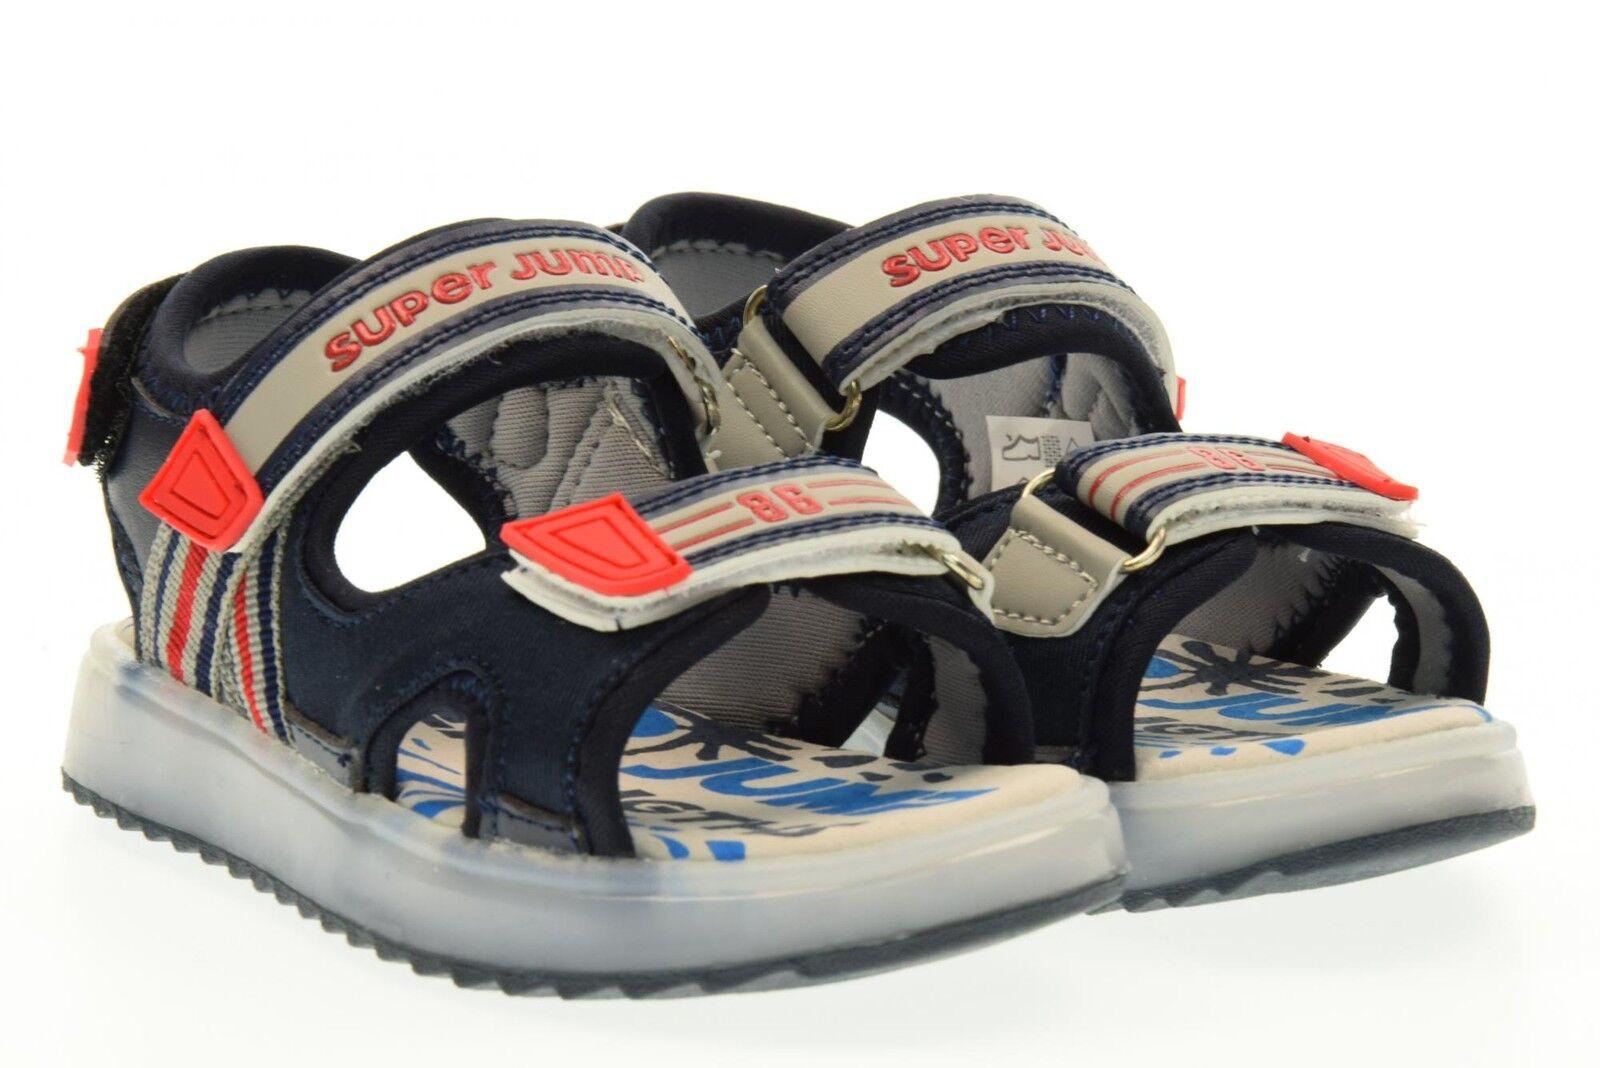 SuperJump Collezione America sandali scarpe bambino sandali America SJ2972 MARTIN BLU P17 56de16